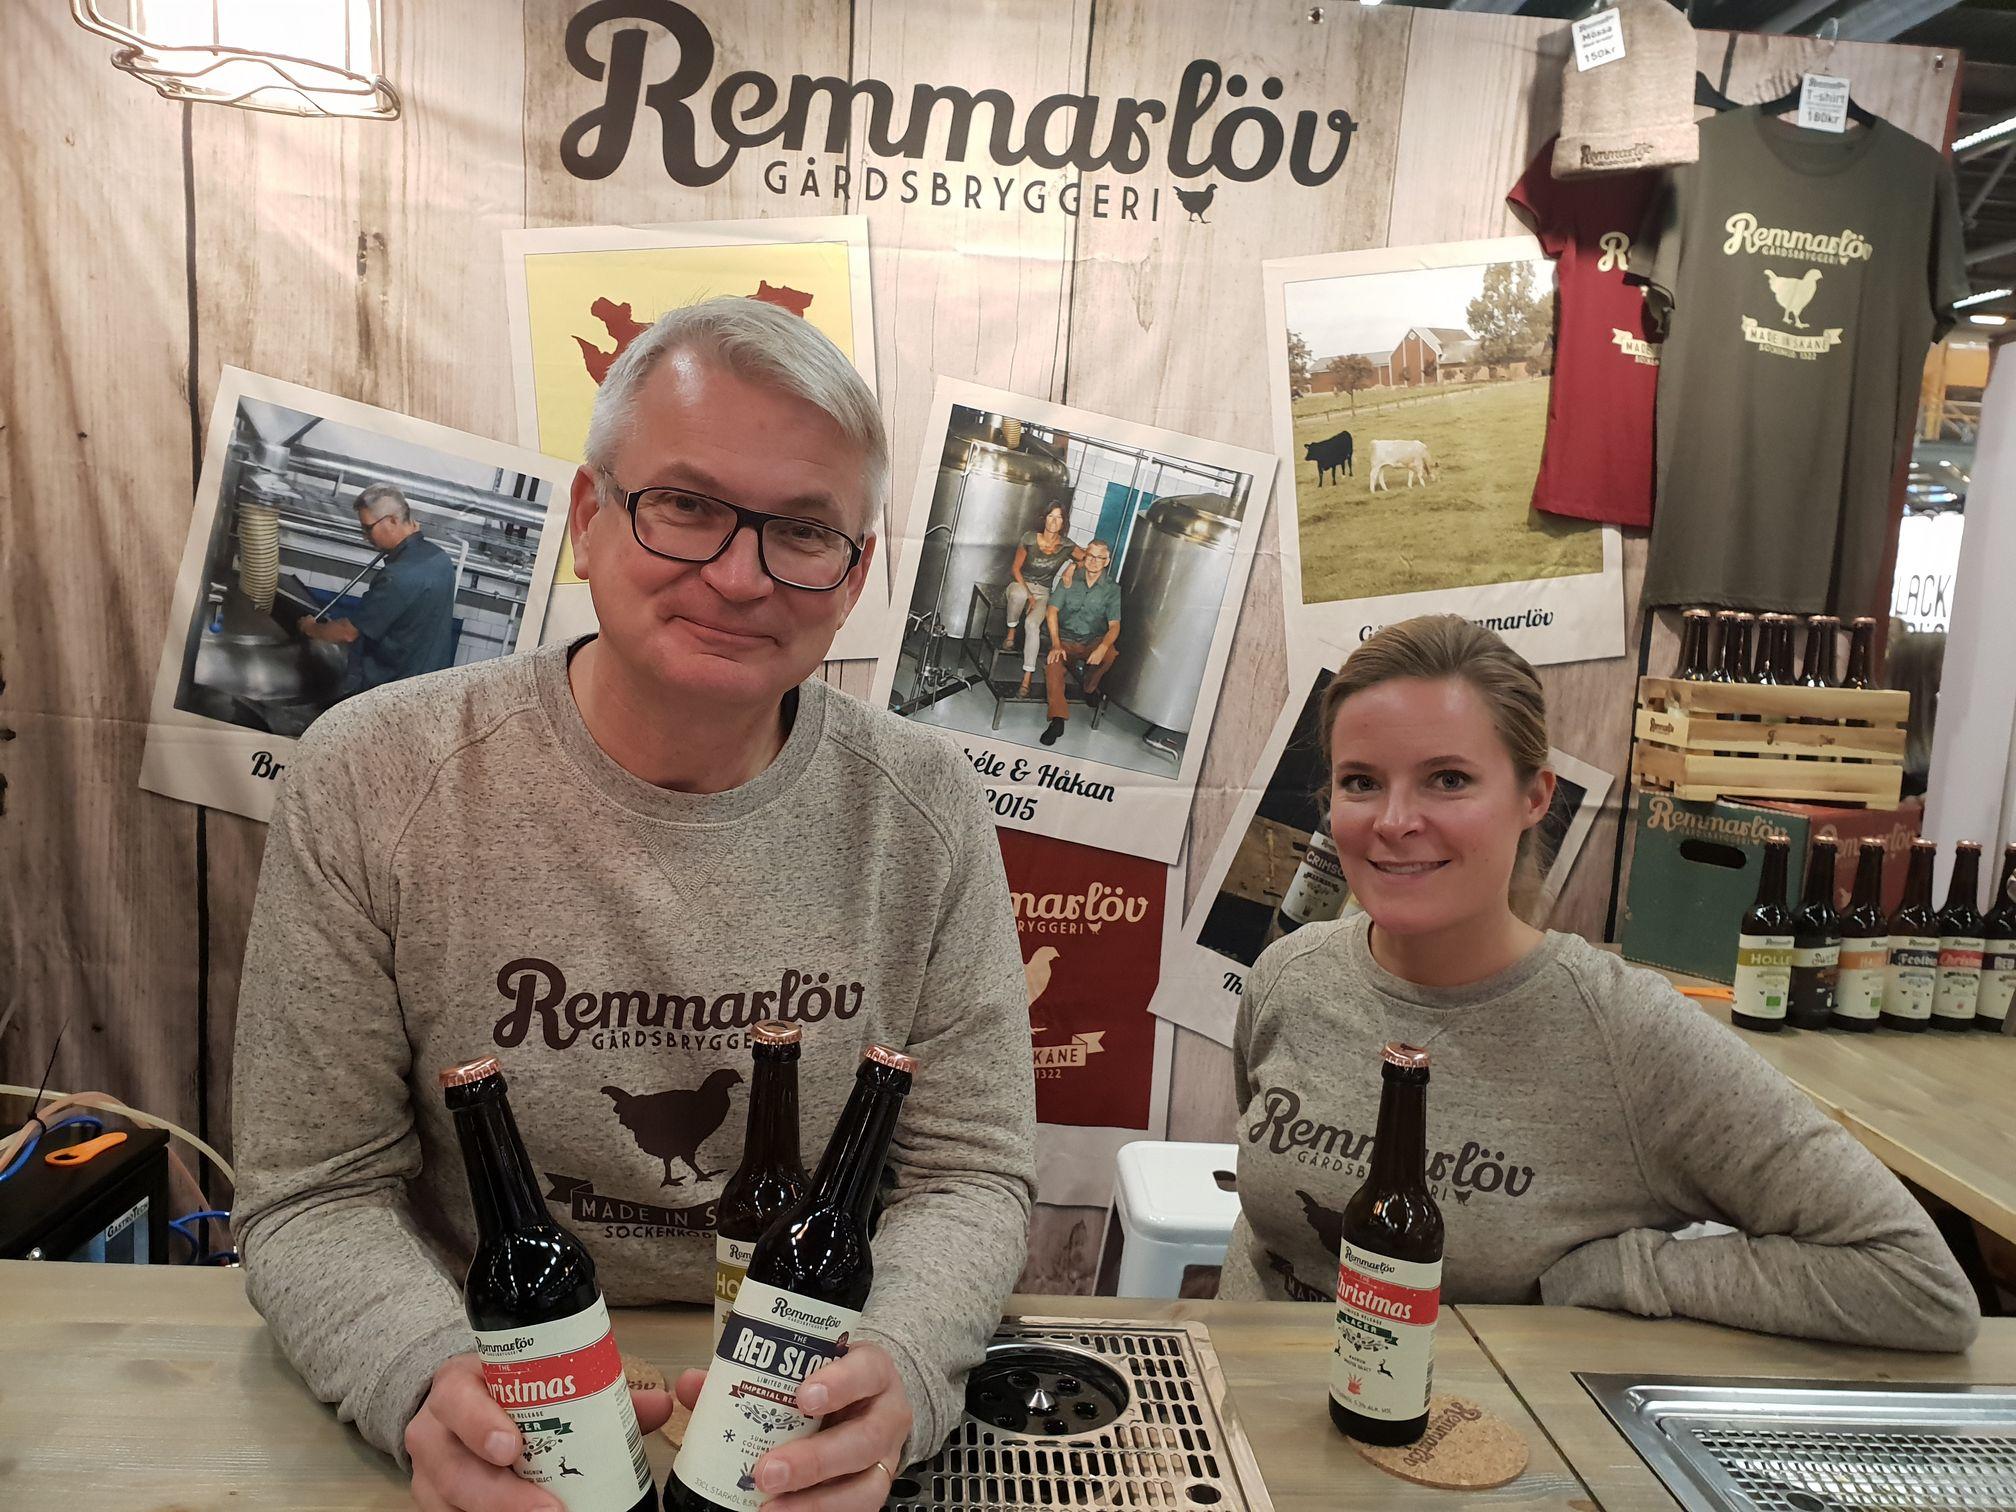 remmarlov-bryggeri-julol2018-vinbanken